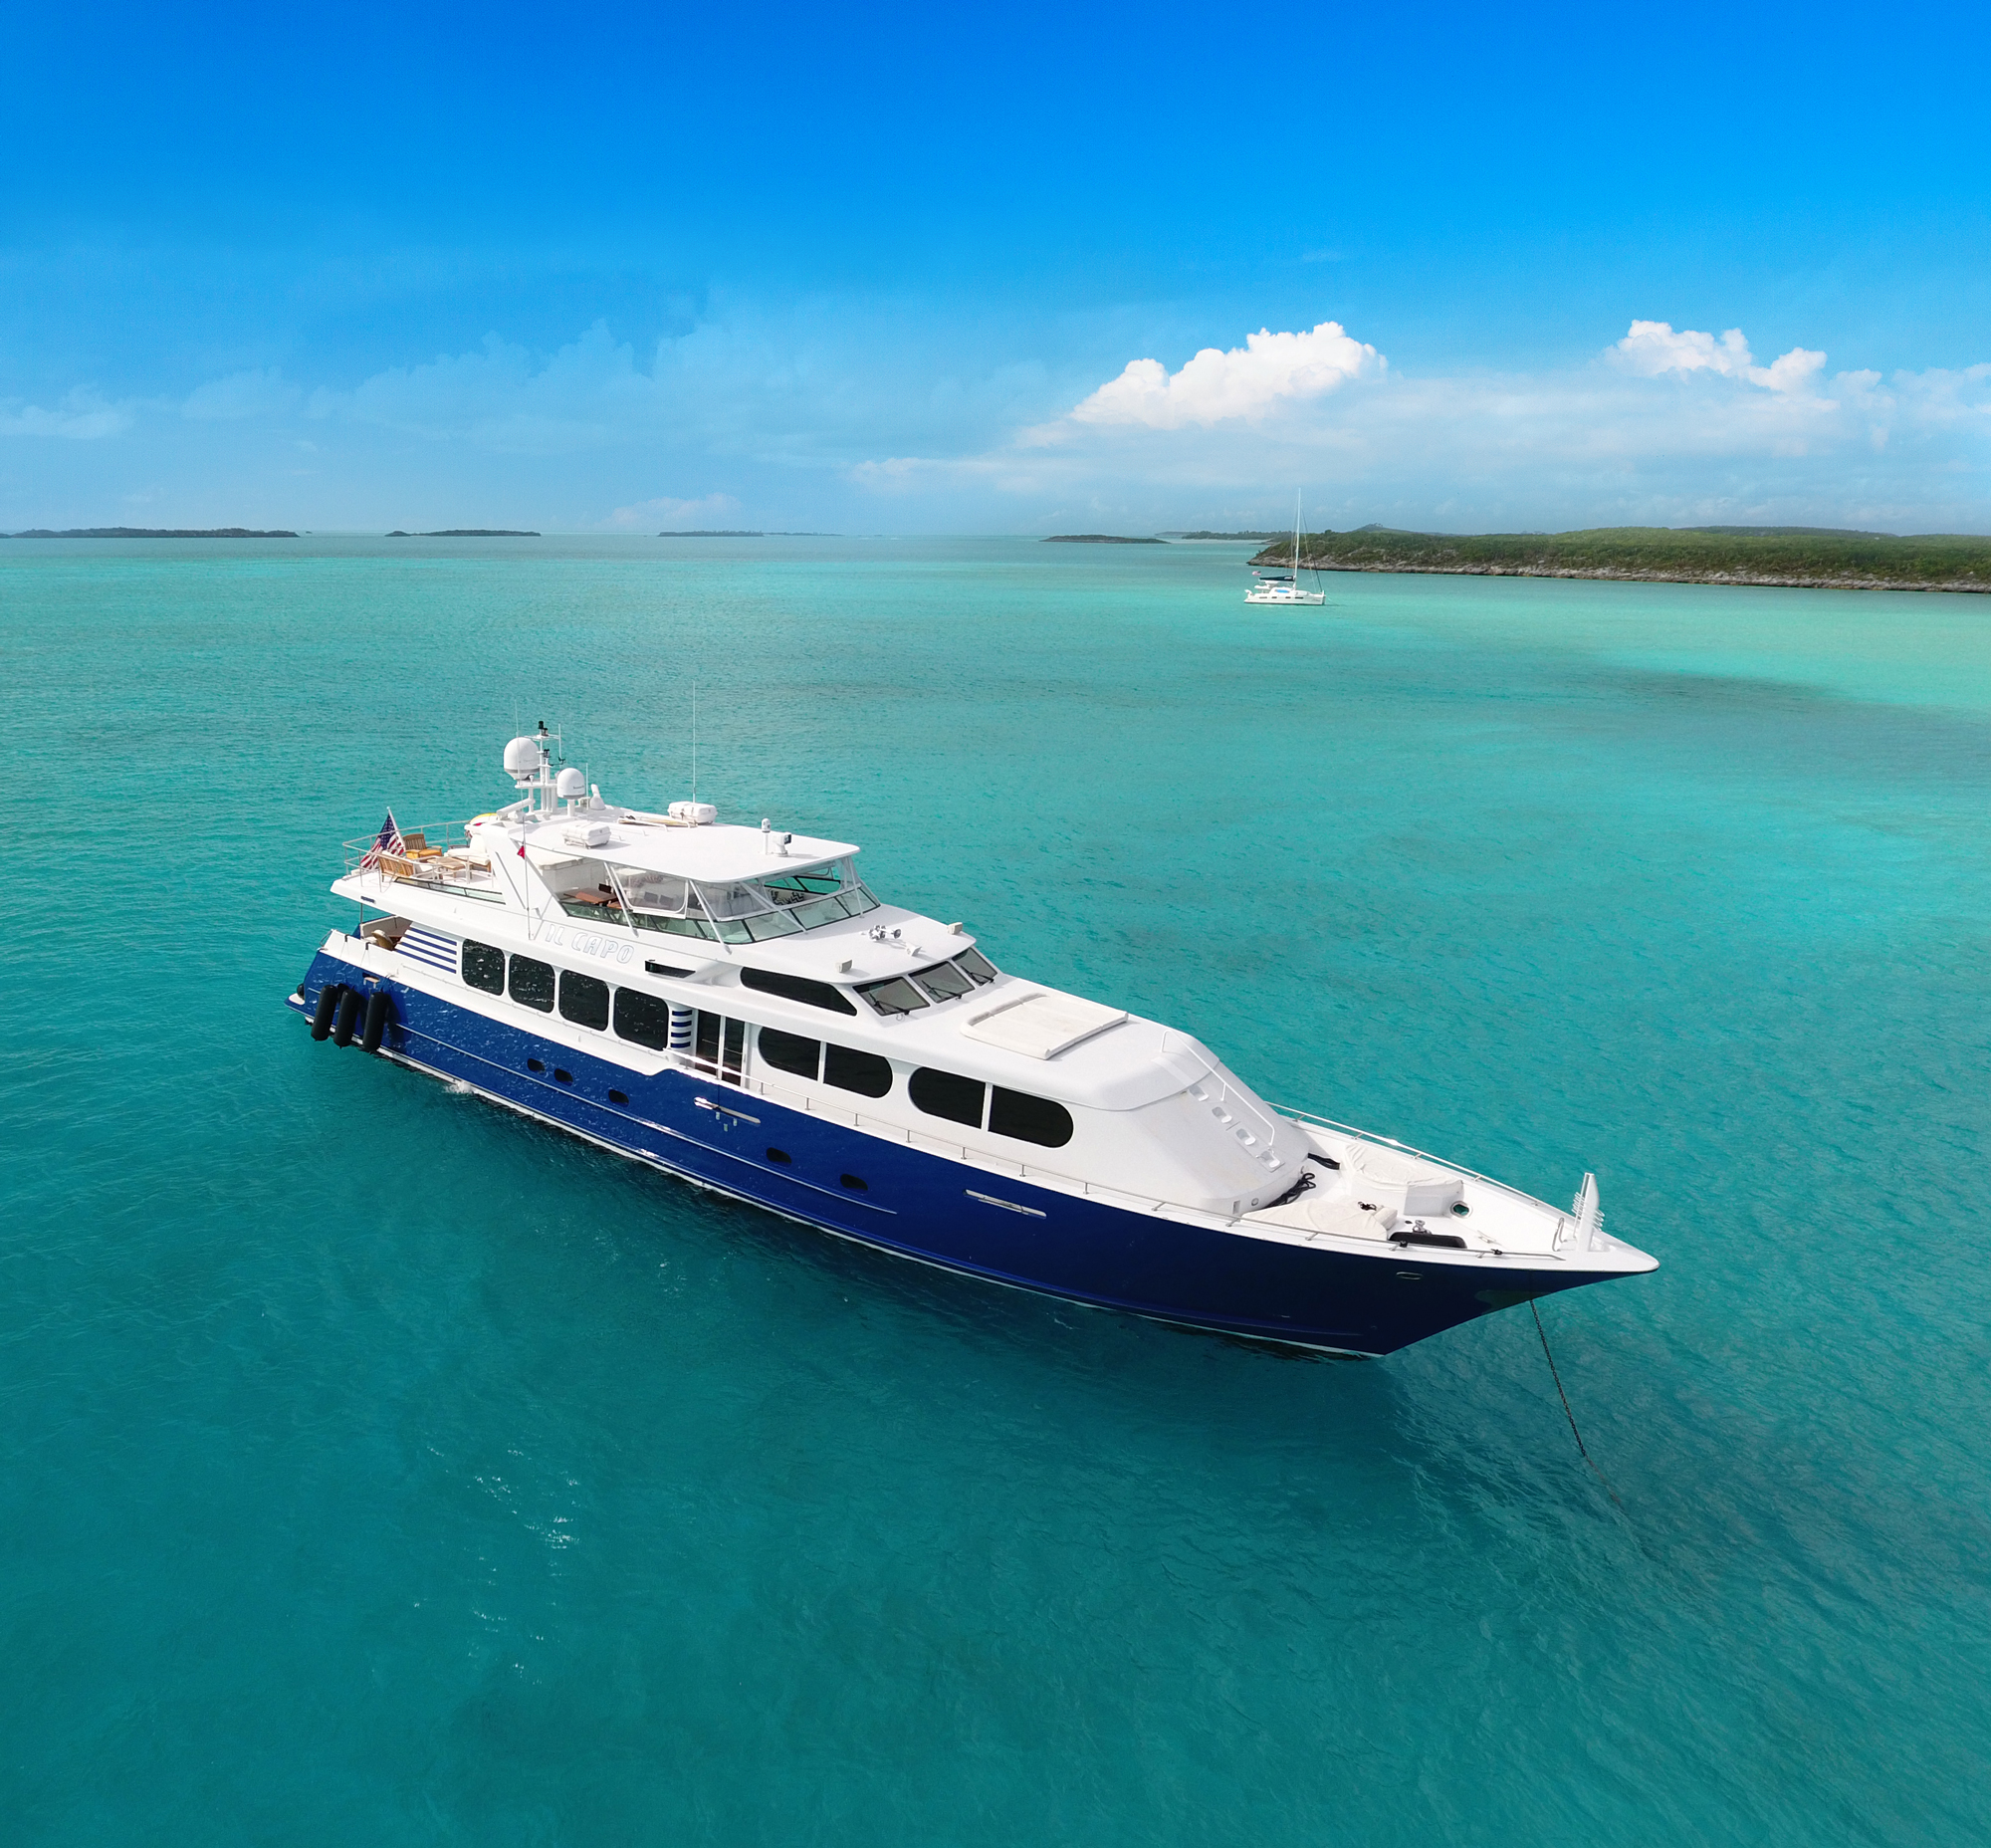 Charter the newly refit 110′ Broward IL CAPO